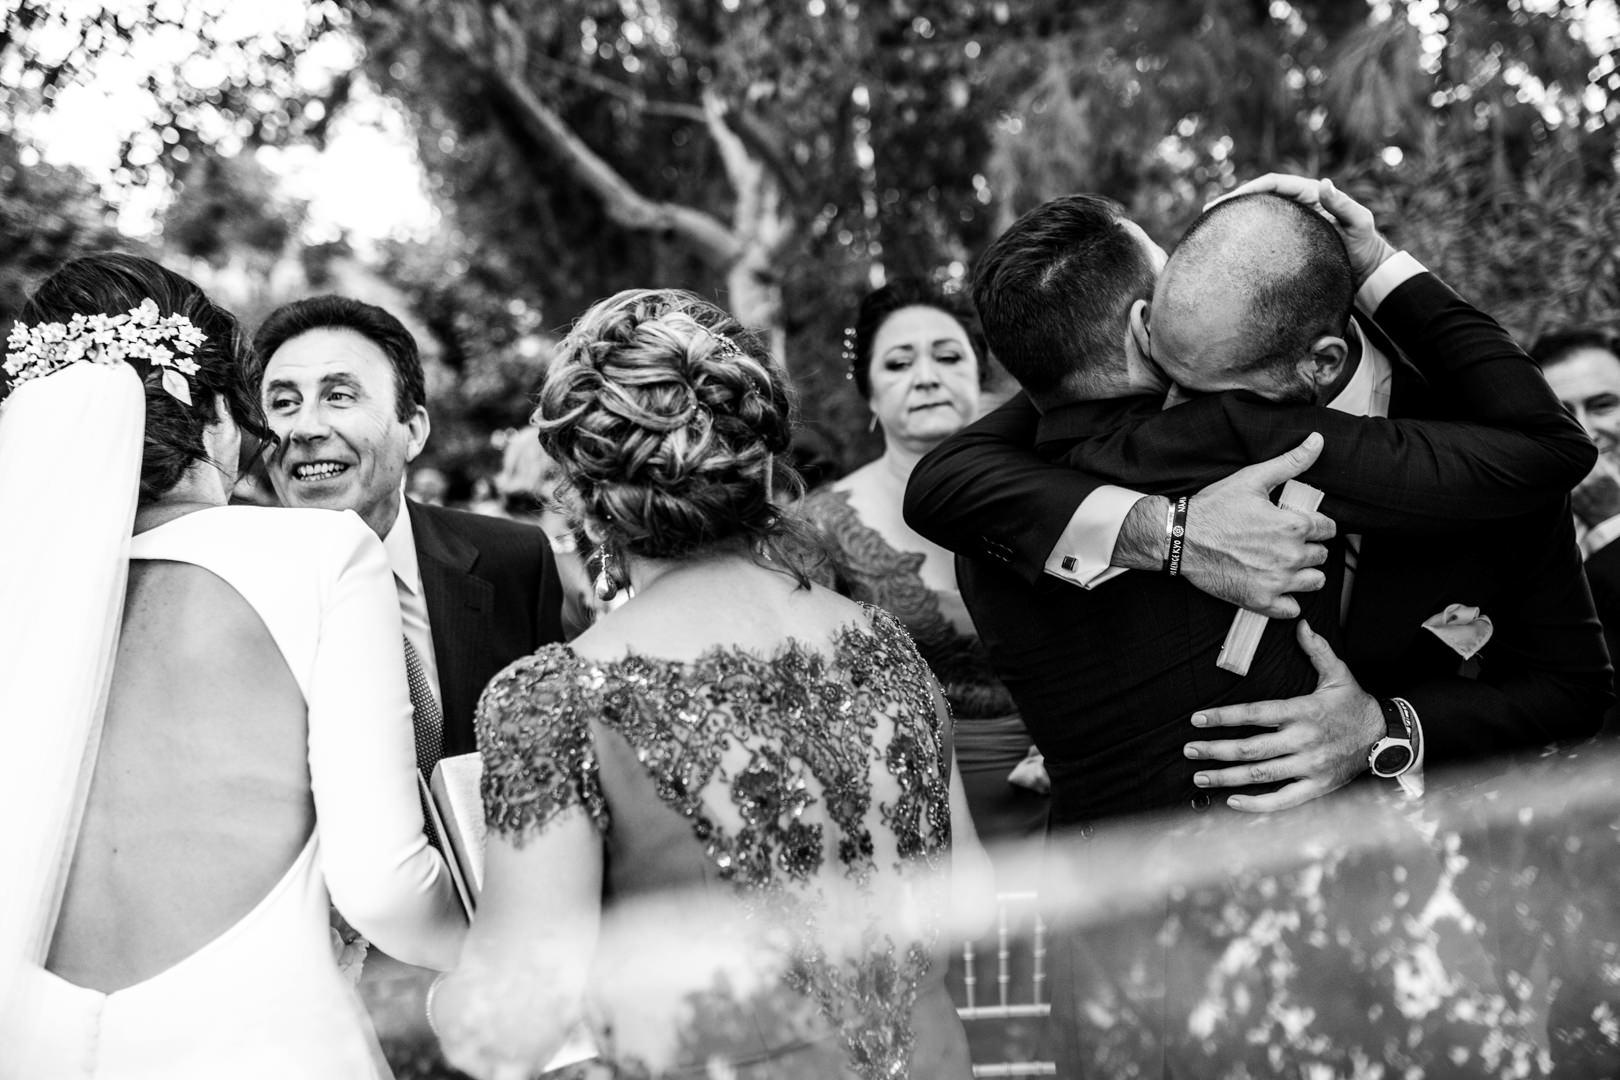 Boda-Irene-Marcos-Dos-Hermanas-Finca-Clotidle-engagement-Rafael-Torres-fotografo-bodas-sevilla-madrid-barcelona-wedding-photographer--28.jpg